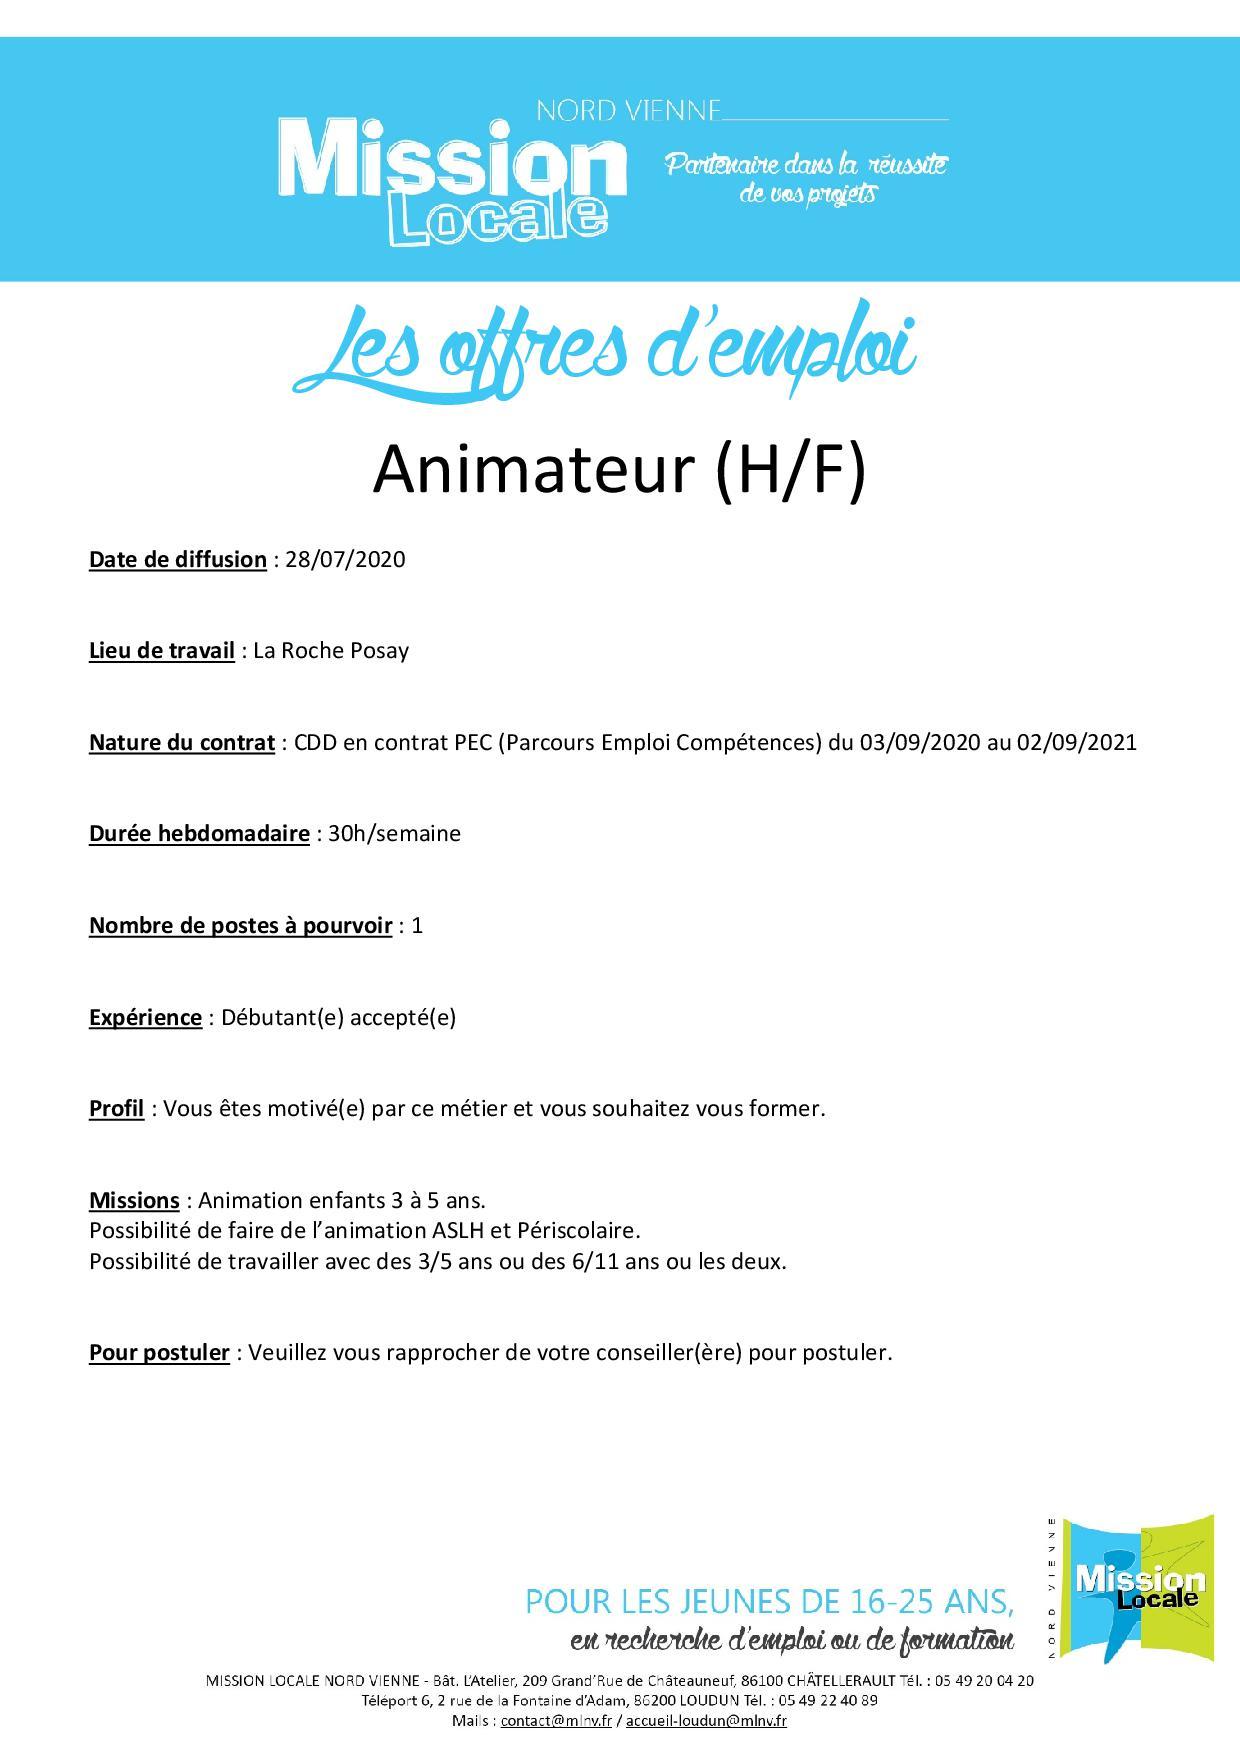 Animateur (H/F)